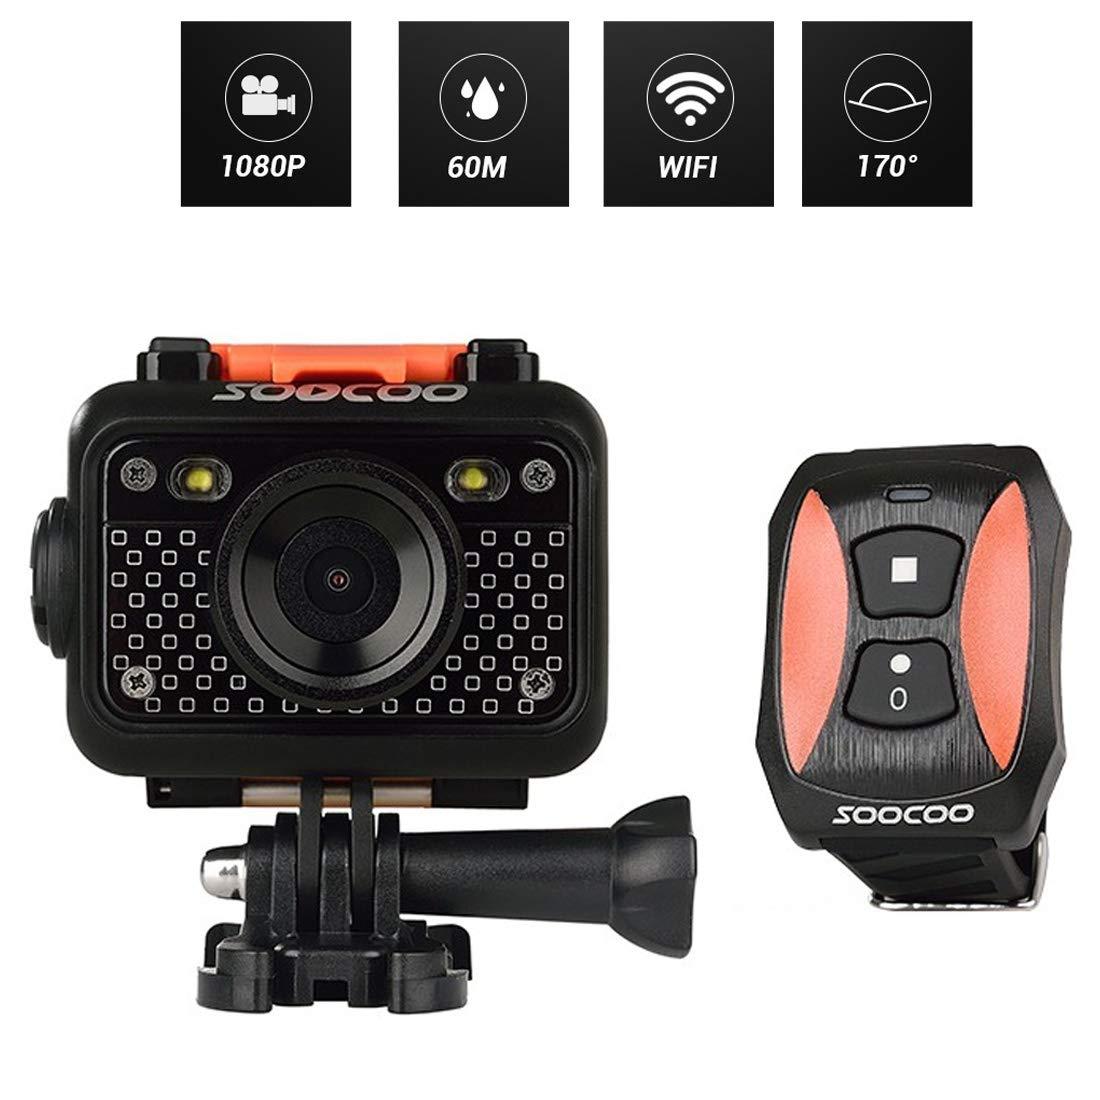 SOOCOO S60 HD 1080 P 1.5インチLCDスクリーンWiFiスポーツカメラ、170度広角レンズ、60m防水(グッド防水性能) Durable   B07QHWMBZJ